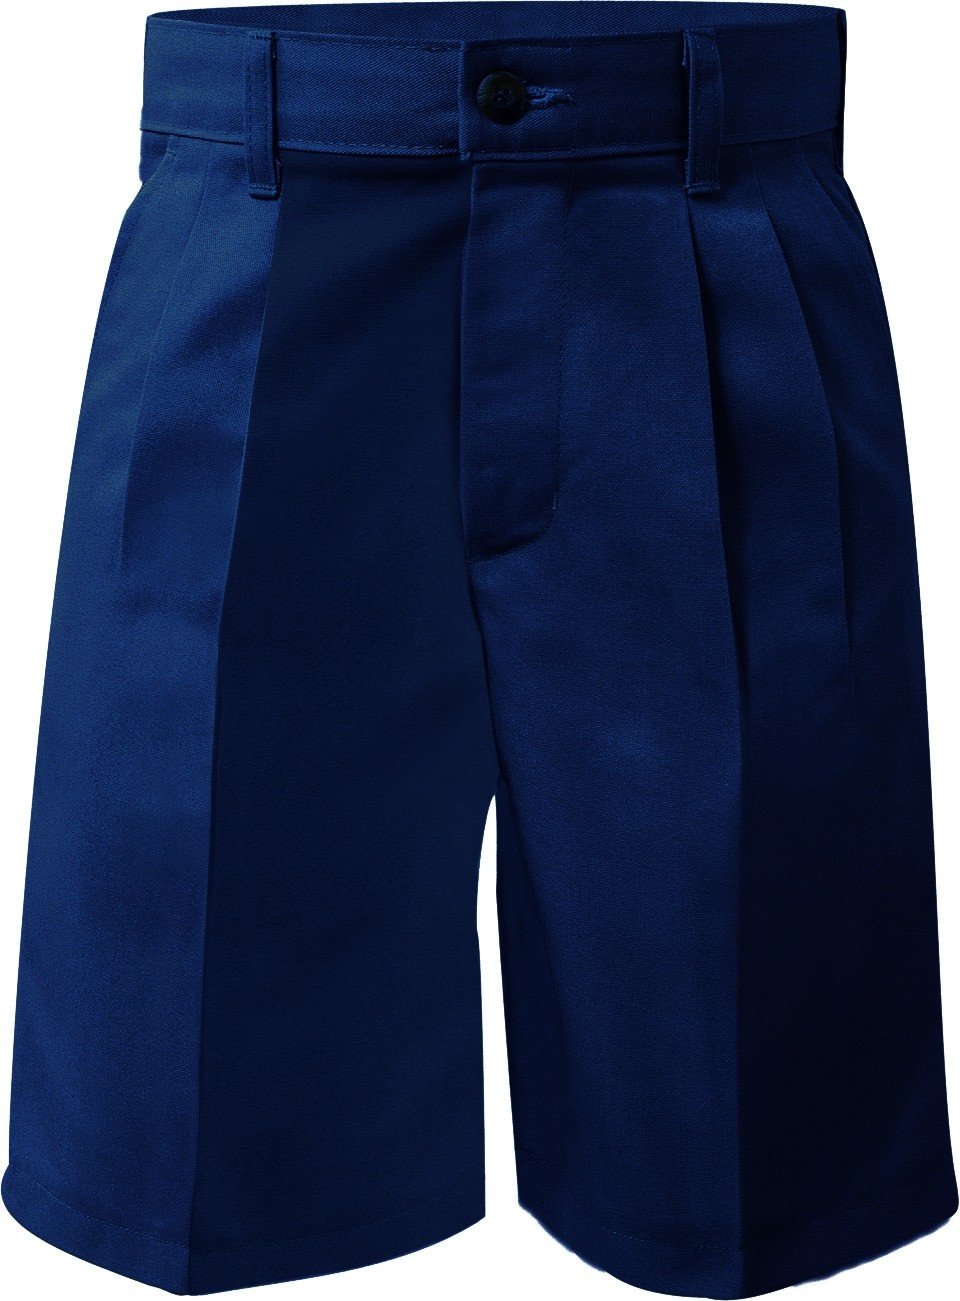 Allen's School Uniforms SMS Prep & Mens Pleated Shorts - Non Elastic Back  #7030